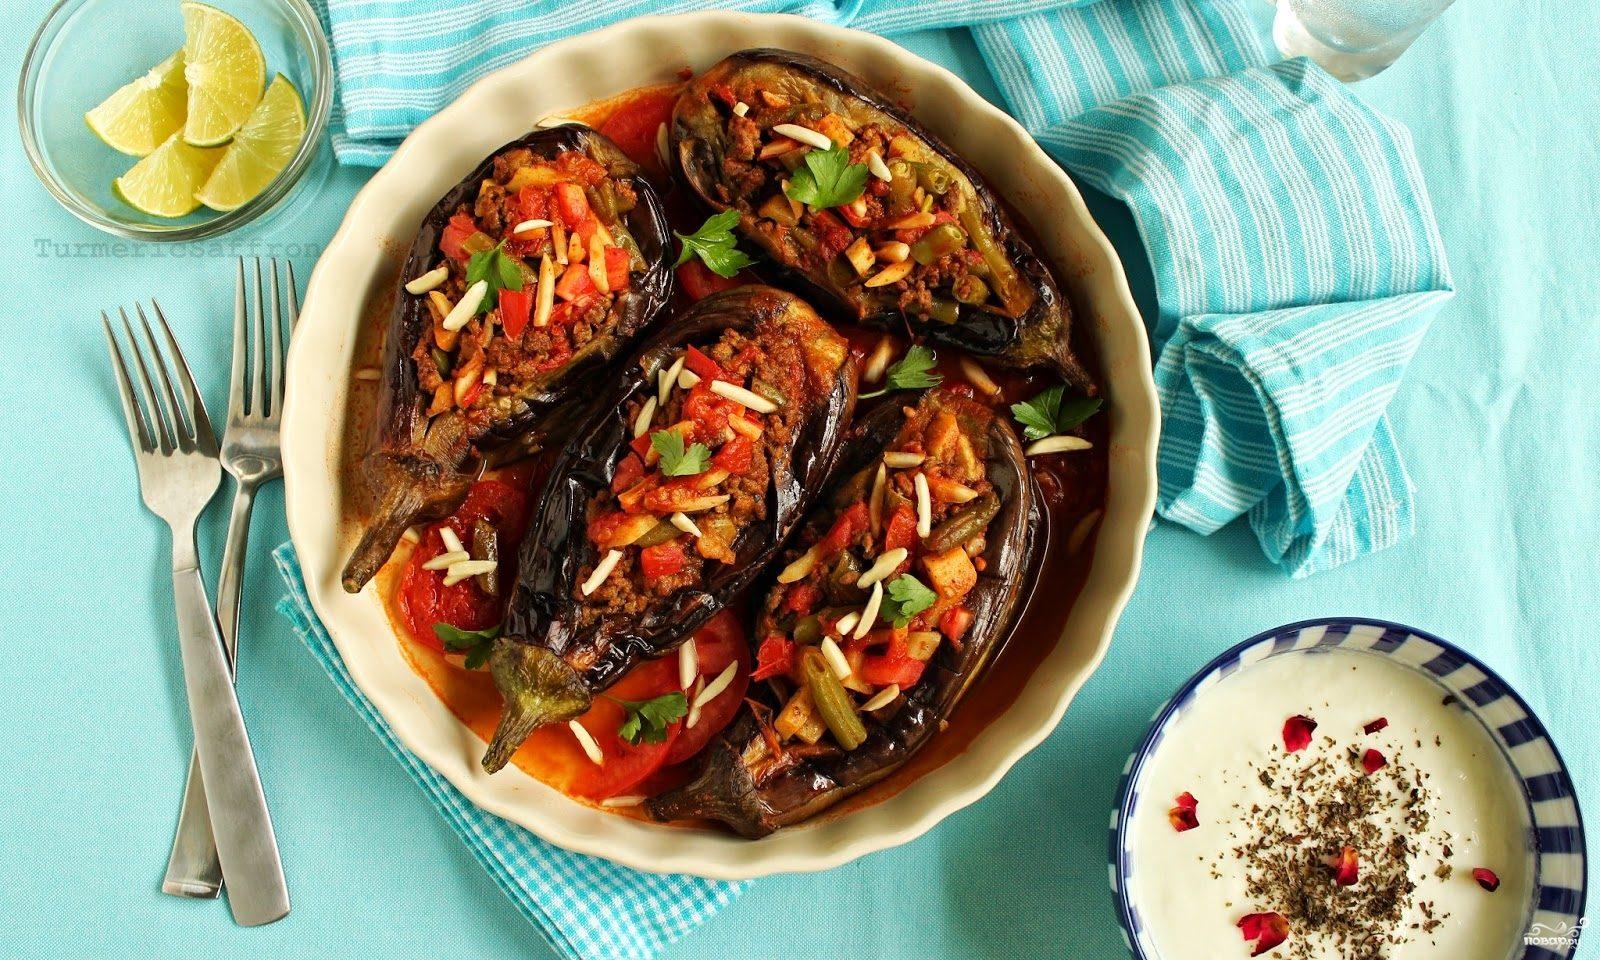 Рецепт Баклажаны по-турецки с фаршем